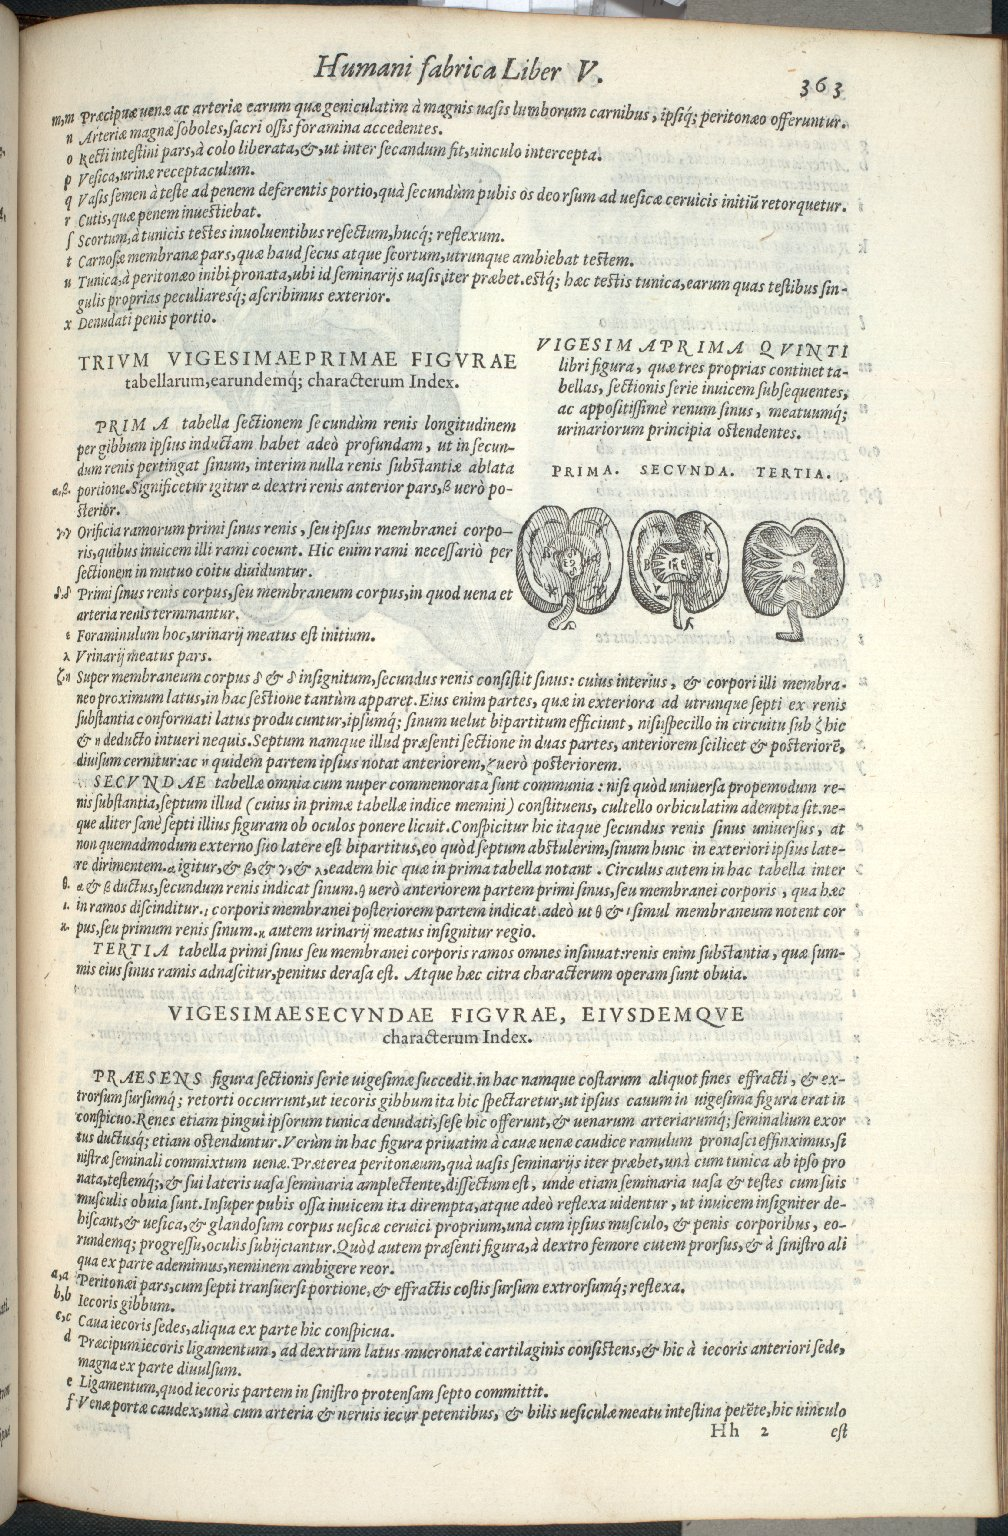 Vigesimaprima Quinti Libri Figura